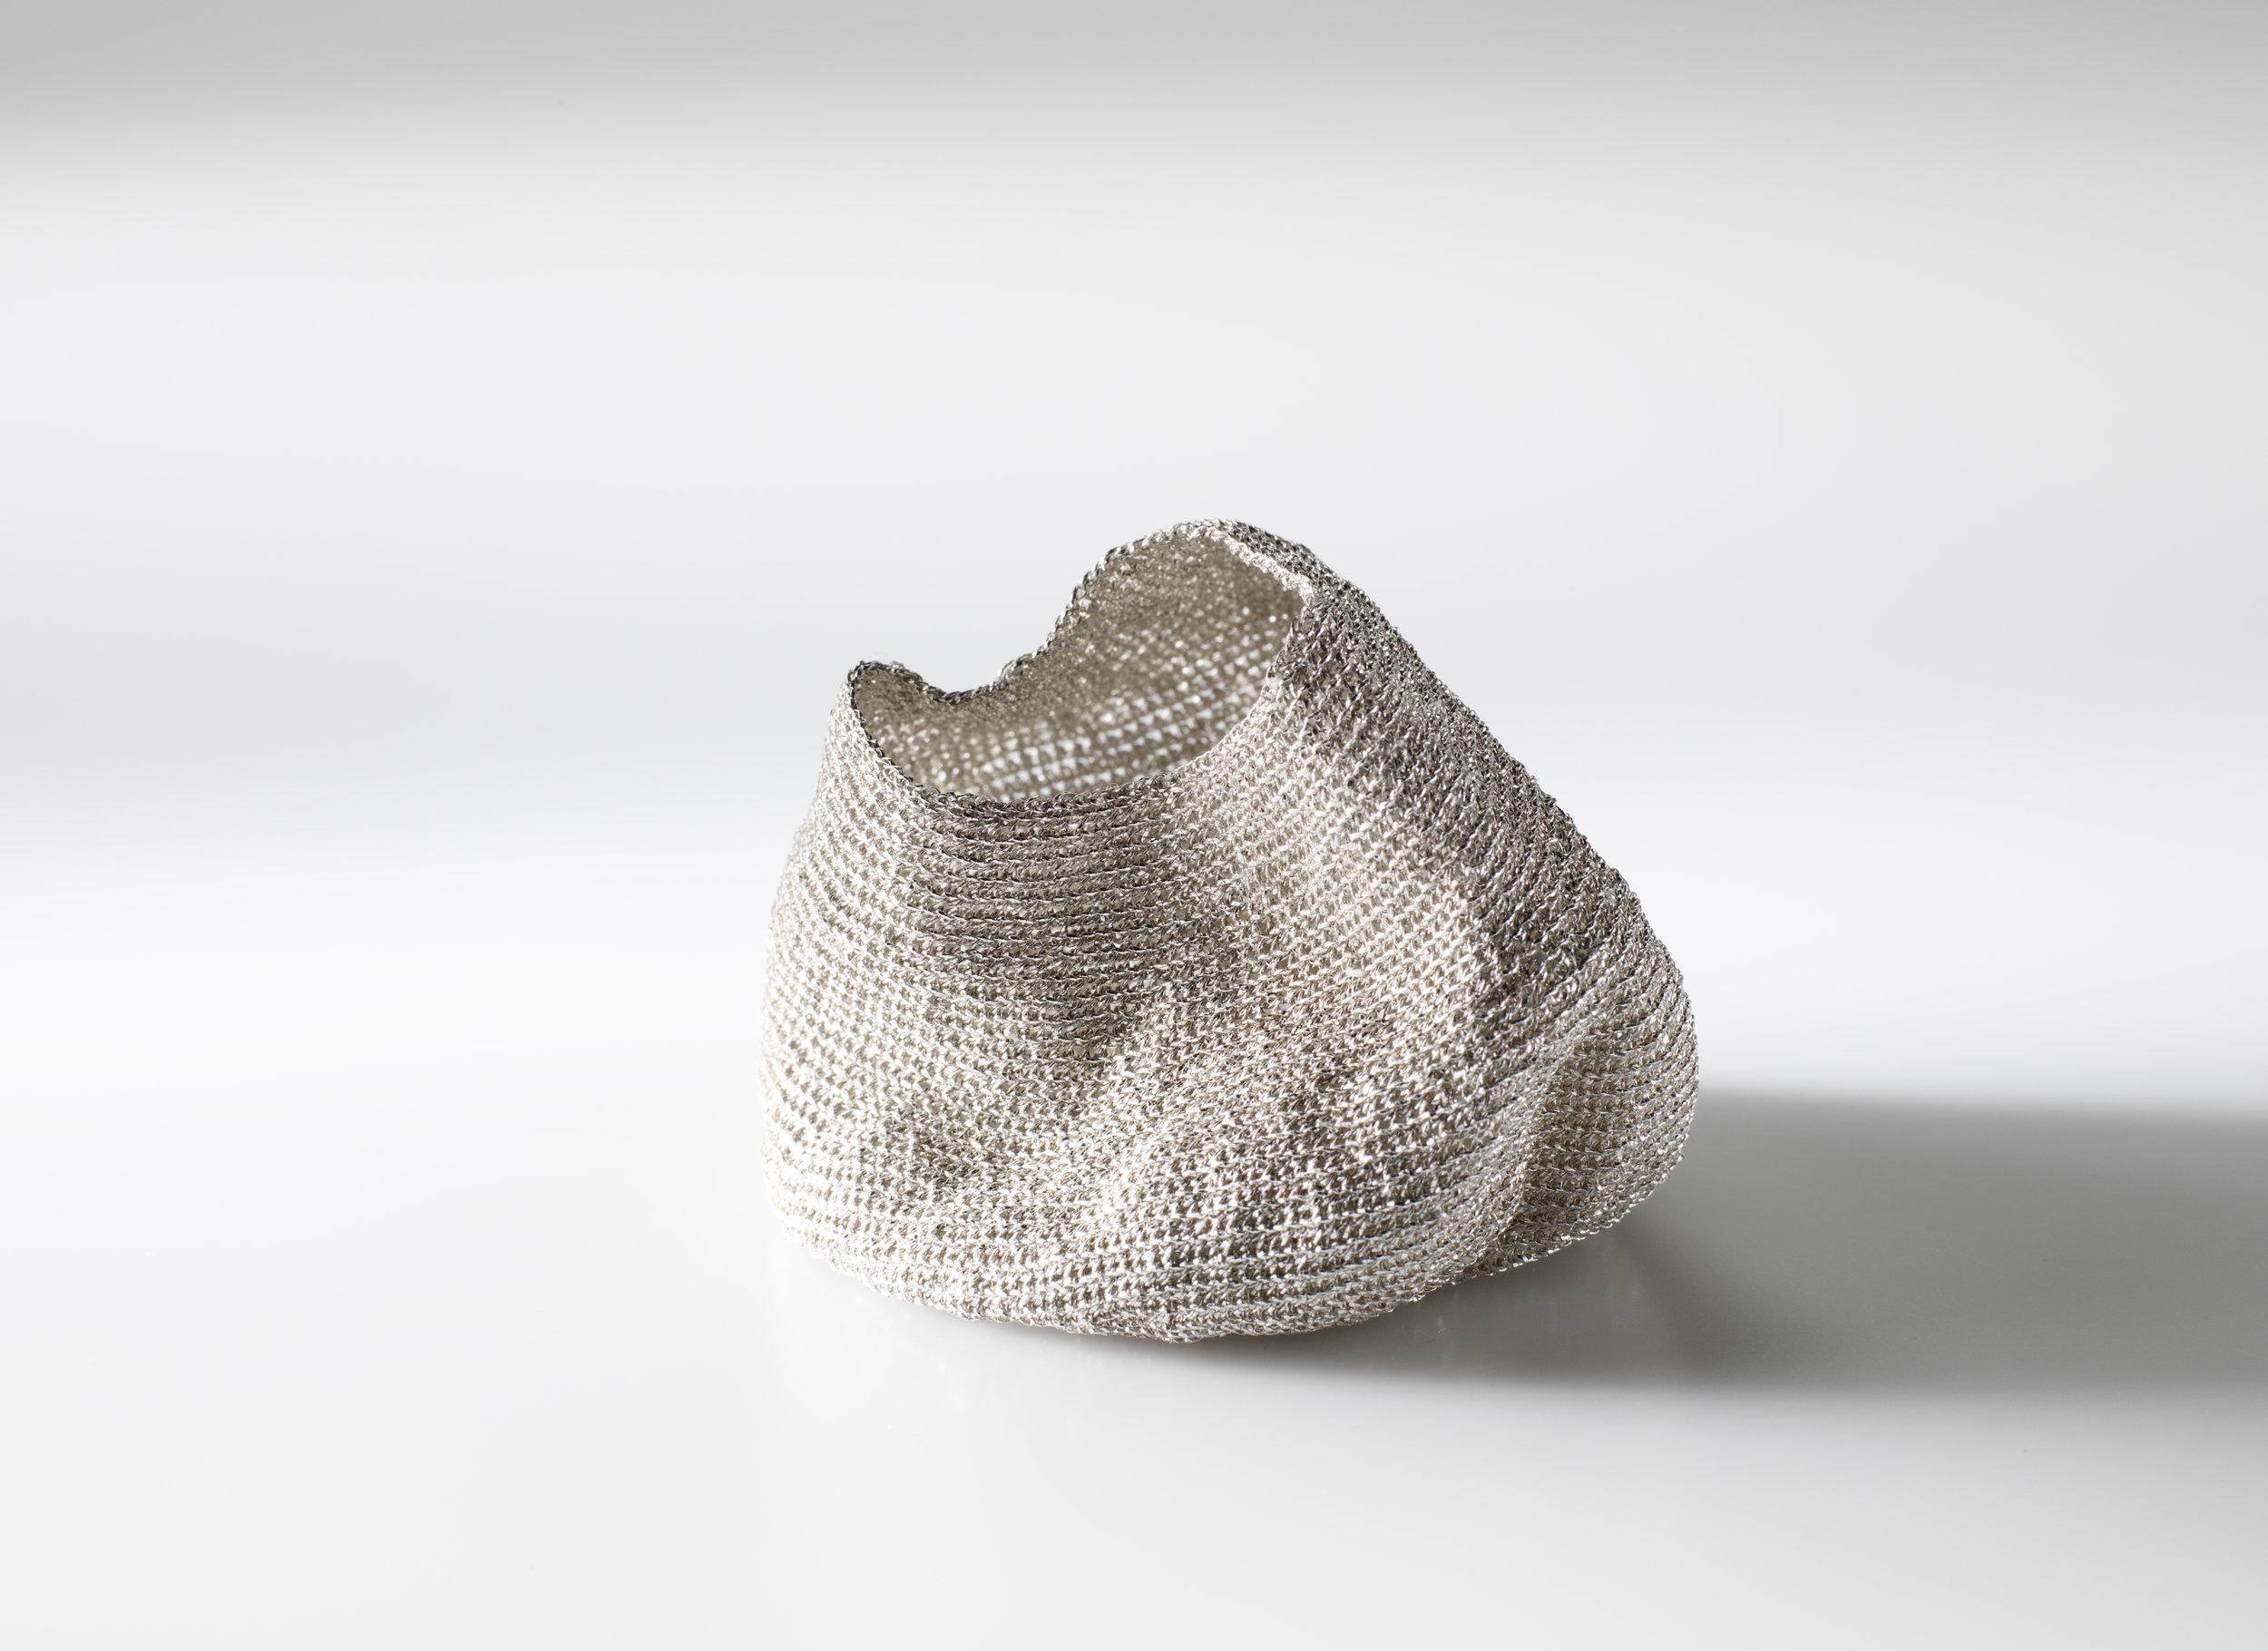 Catherine Buddle  Chrysalis iii  2016  Hand-crochet silver mi-fin thread, 925 brooch back 编制银线,925银搭扣 45 x 60 x 65 毫米 mm